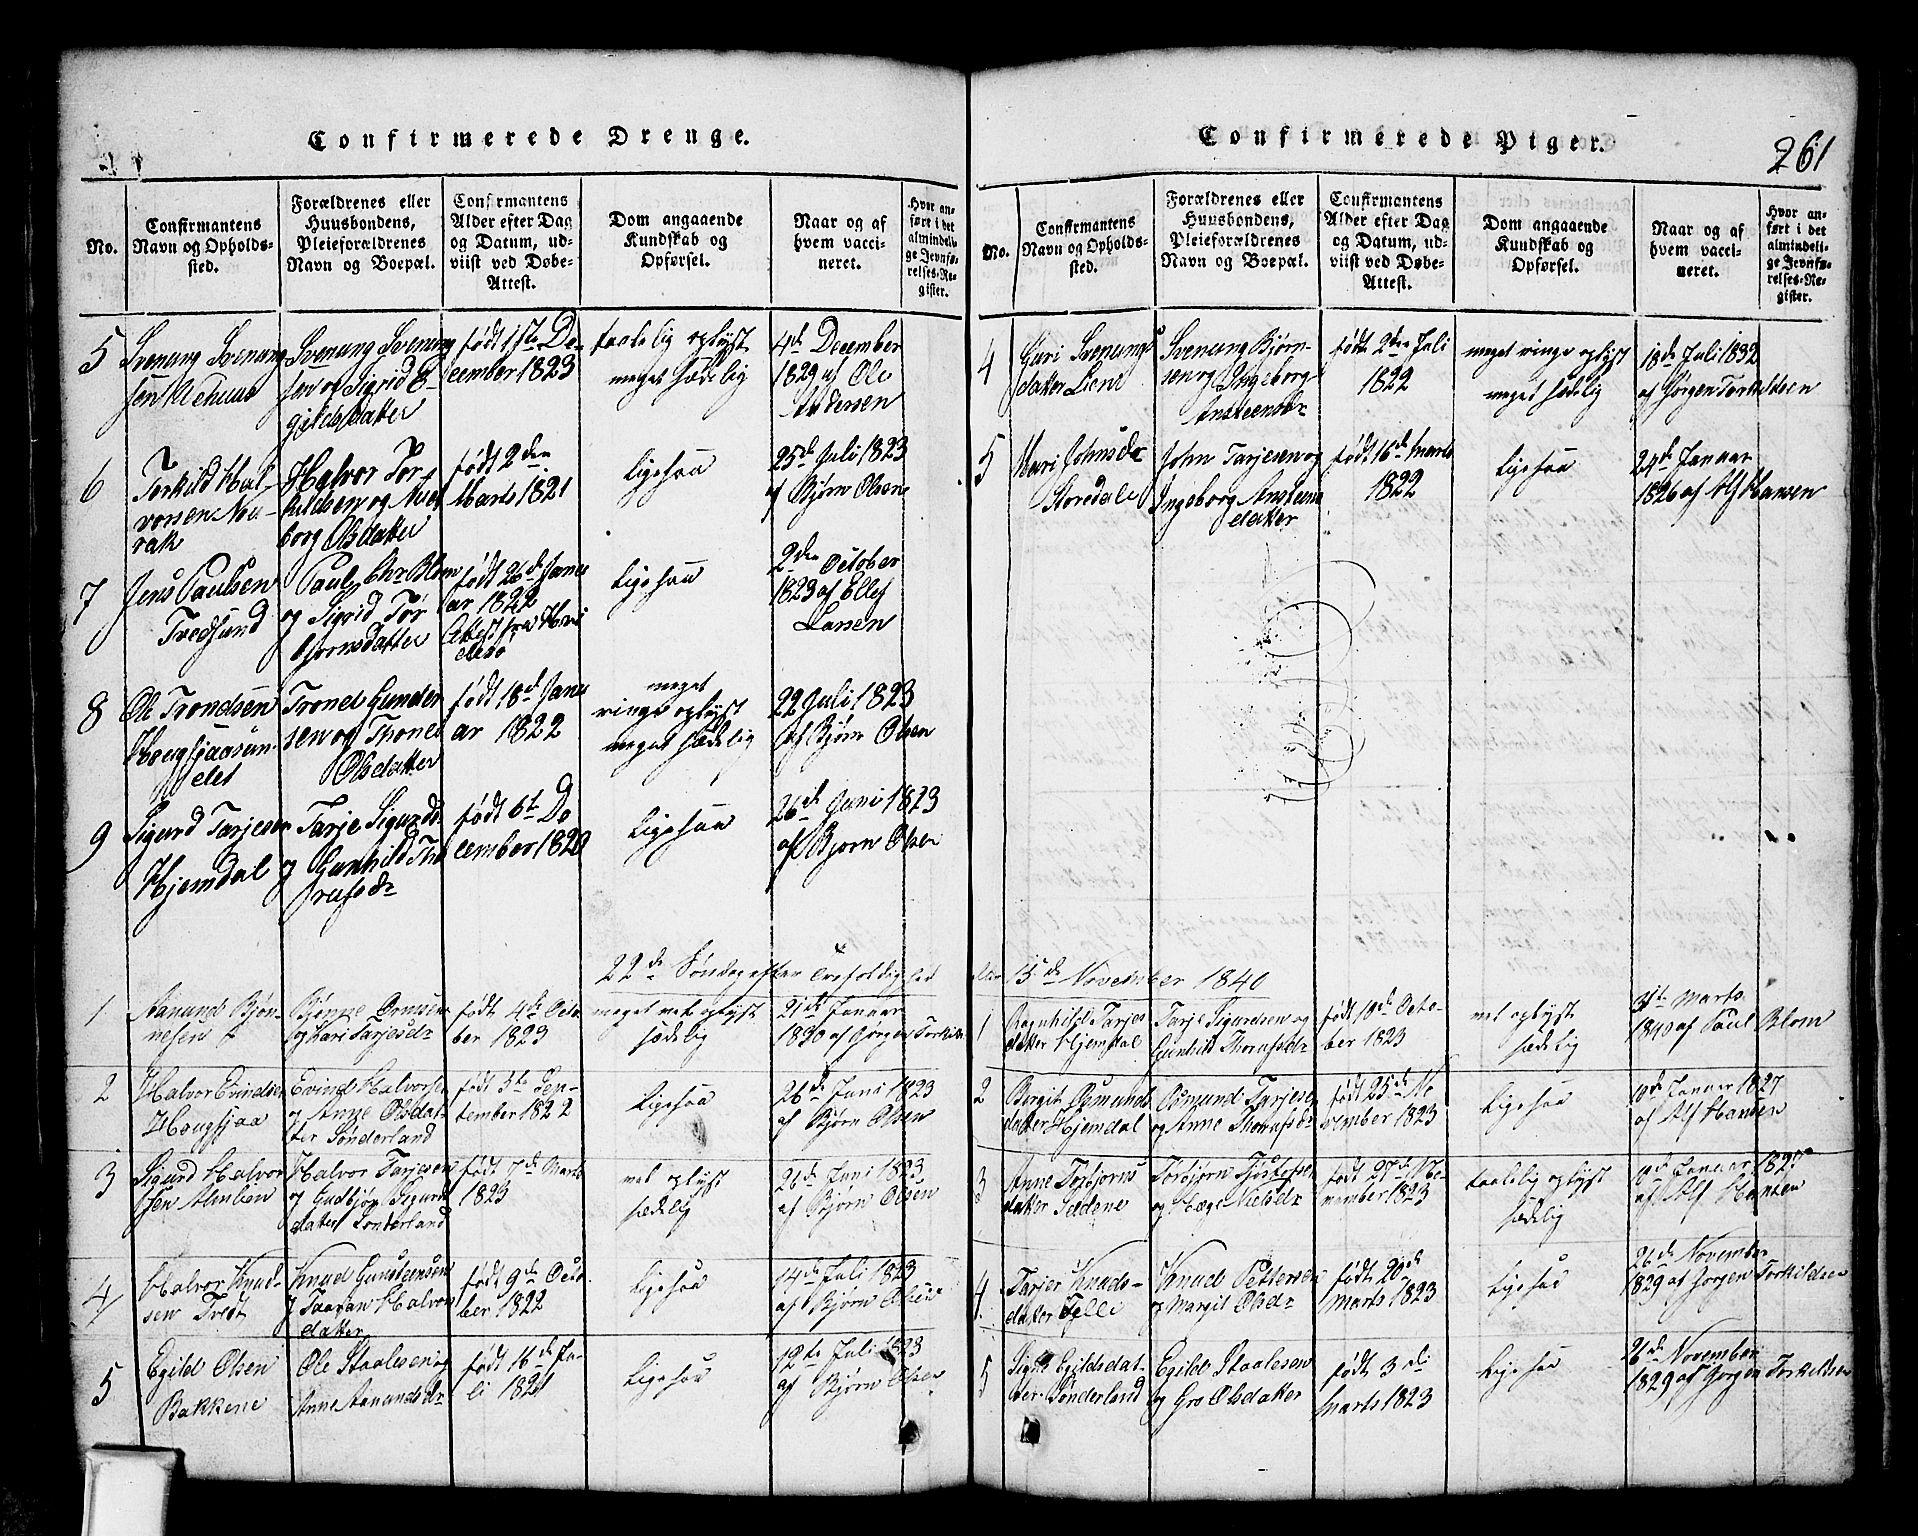 SAKO, Nissedal kirkebøker, G/Gb/L0001: Klokkerbok nr. II 1, 1814-1862, s. 261